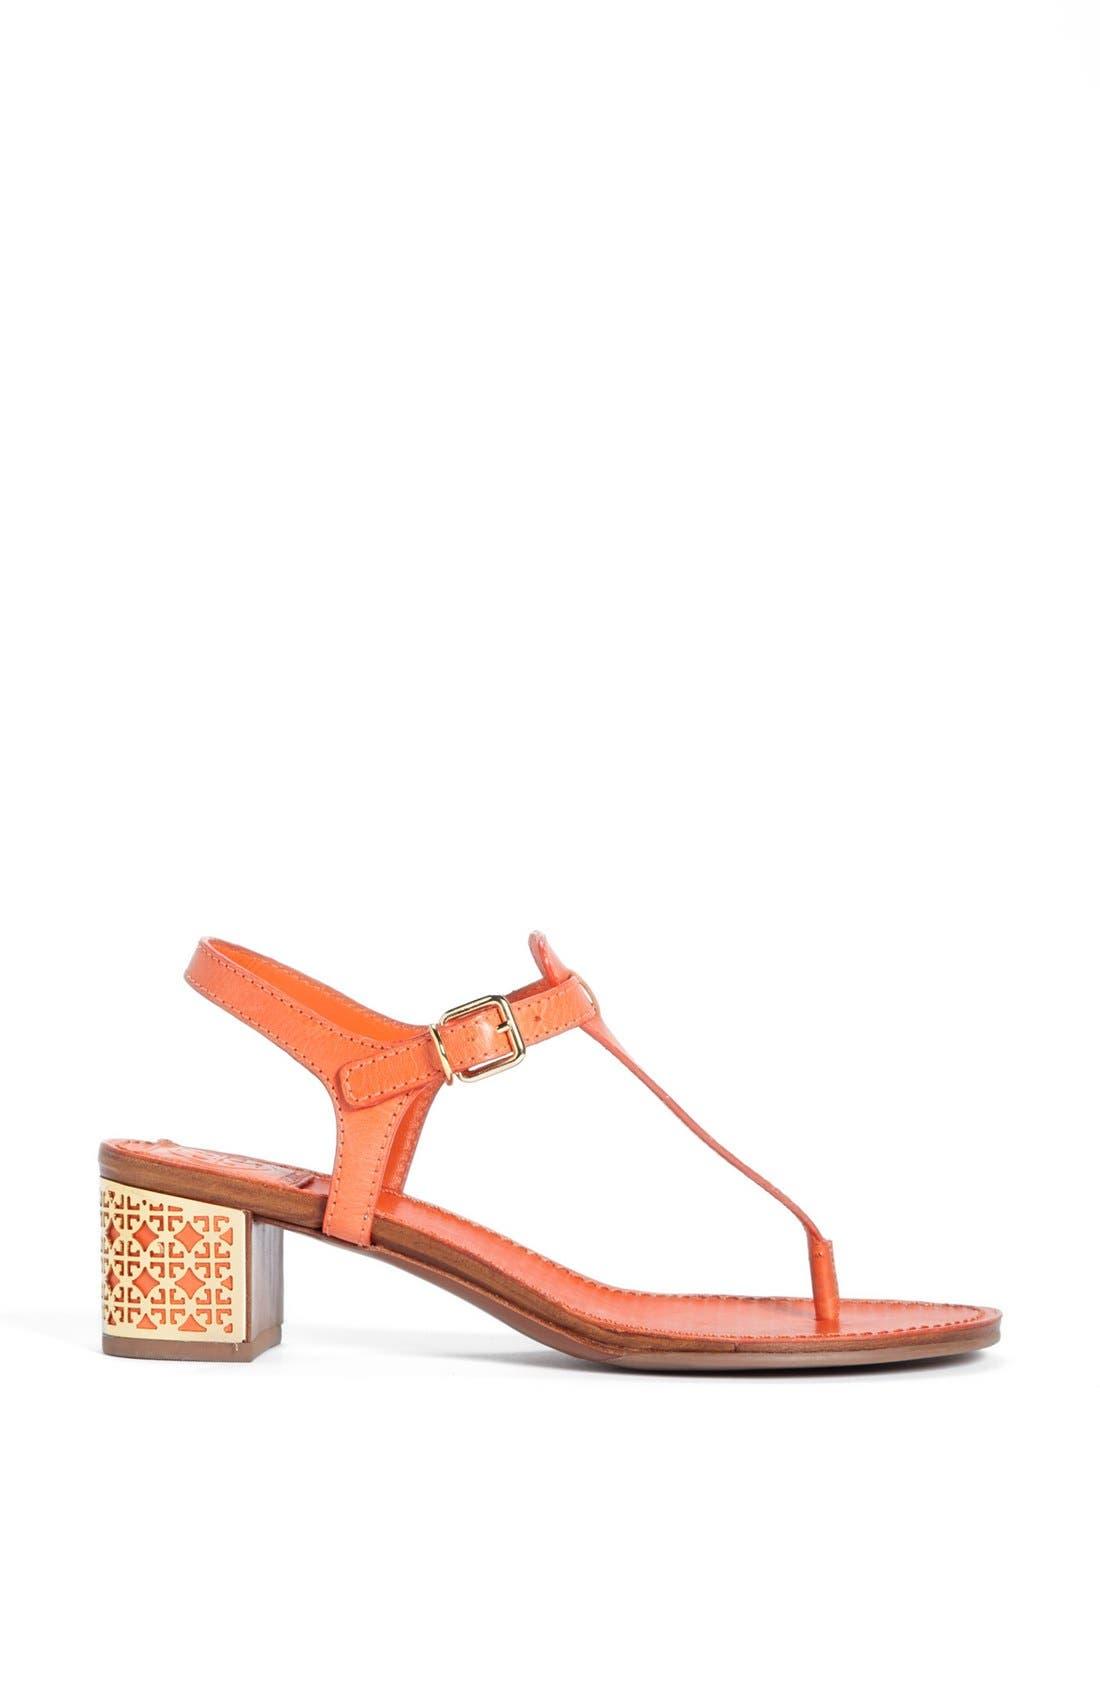 'Audra' Sandal,                             Alternate thumbnail 4, color,                             Tiger Lily